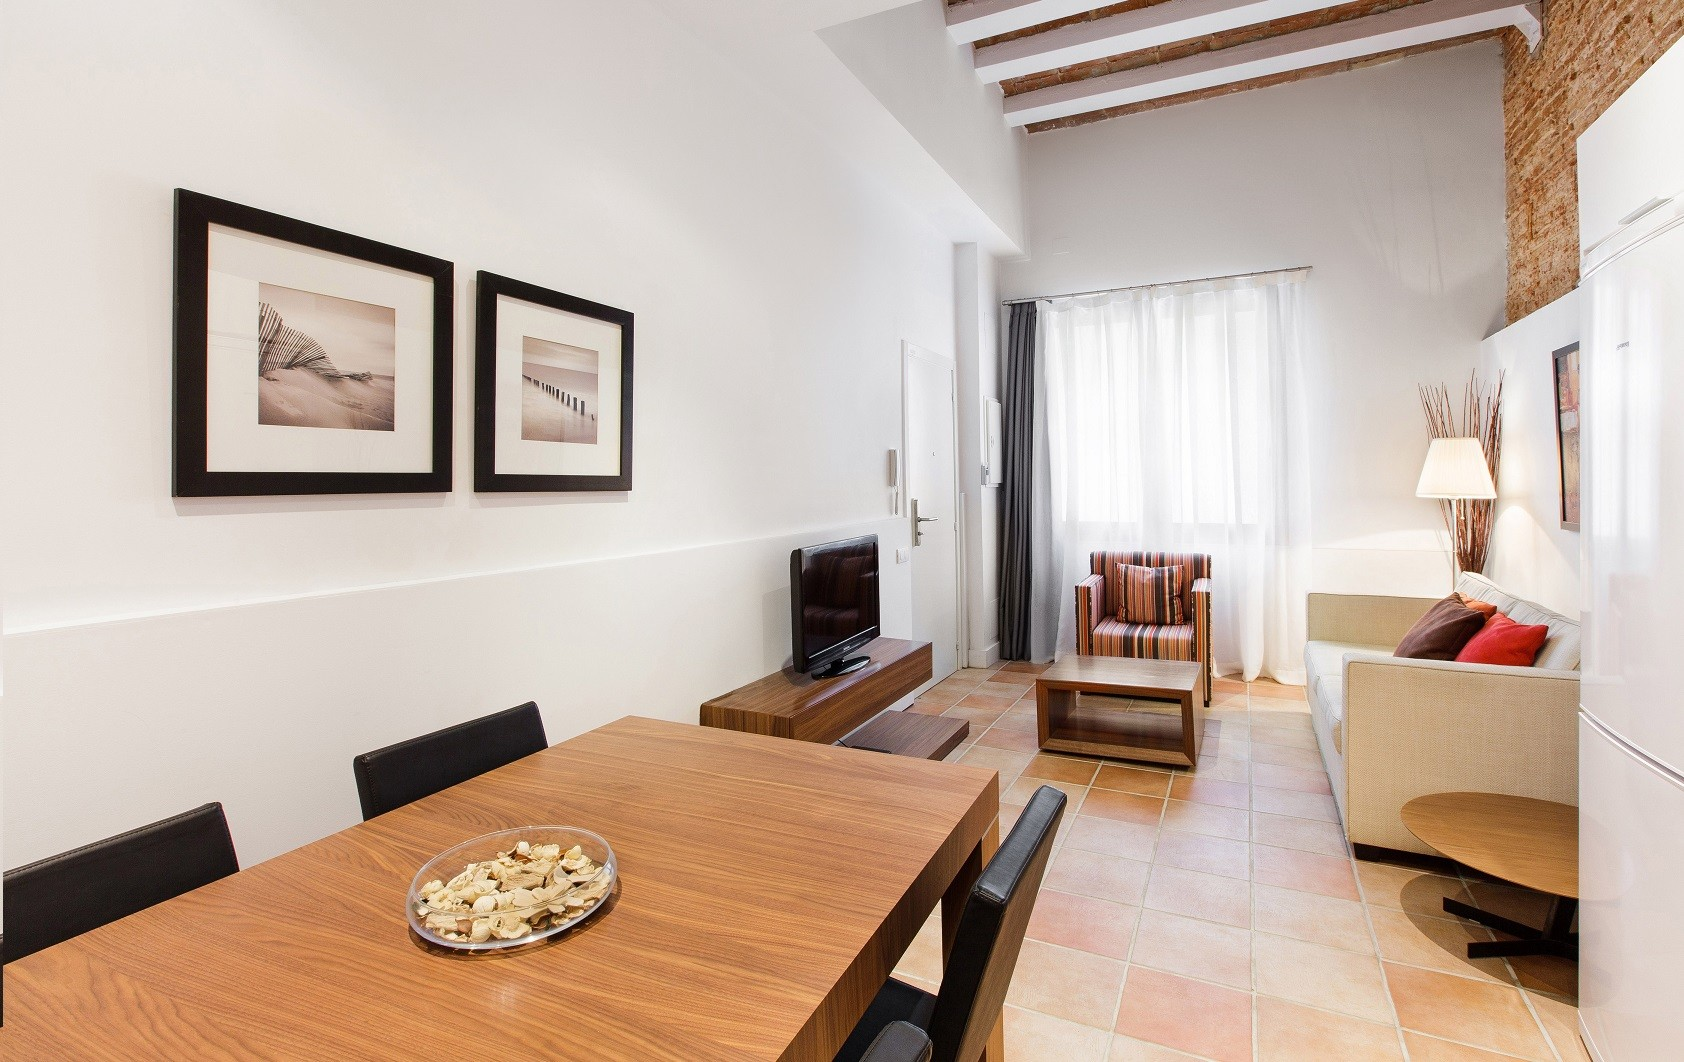 Dailyflats Sagrada Familia area Classic 1-bedroom (1-4 adults) apartments in Barcelona 14